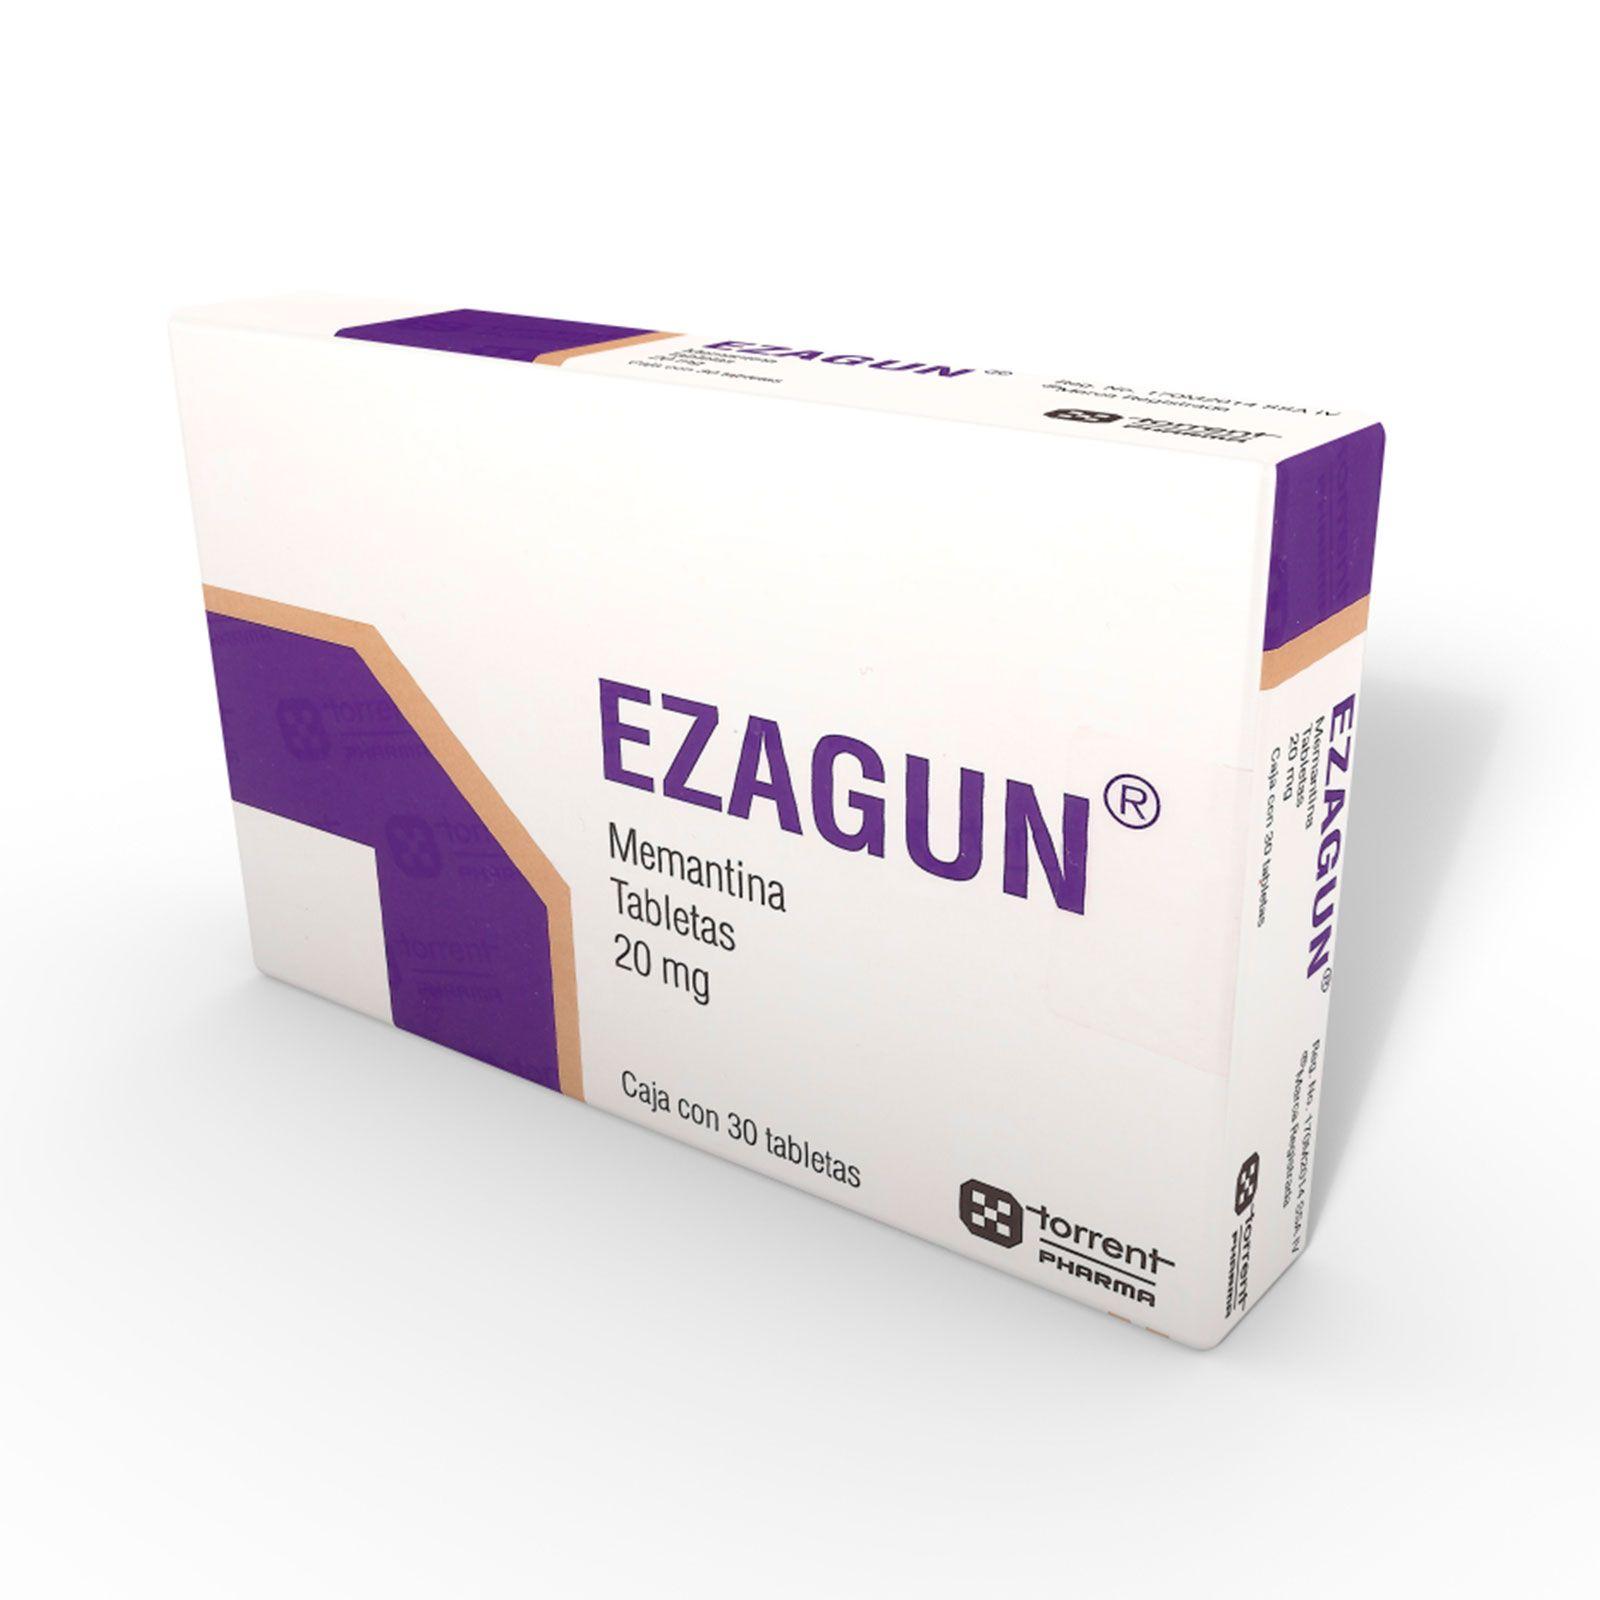 Comprar Ezagun 20 Mg 1 Caja 30 Tabletas